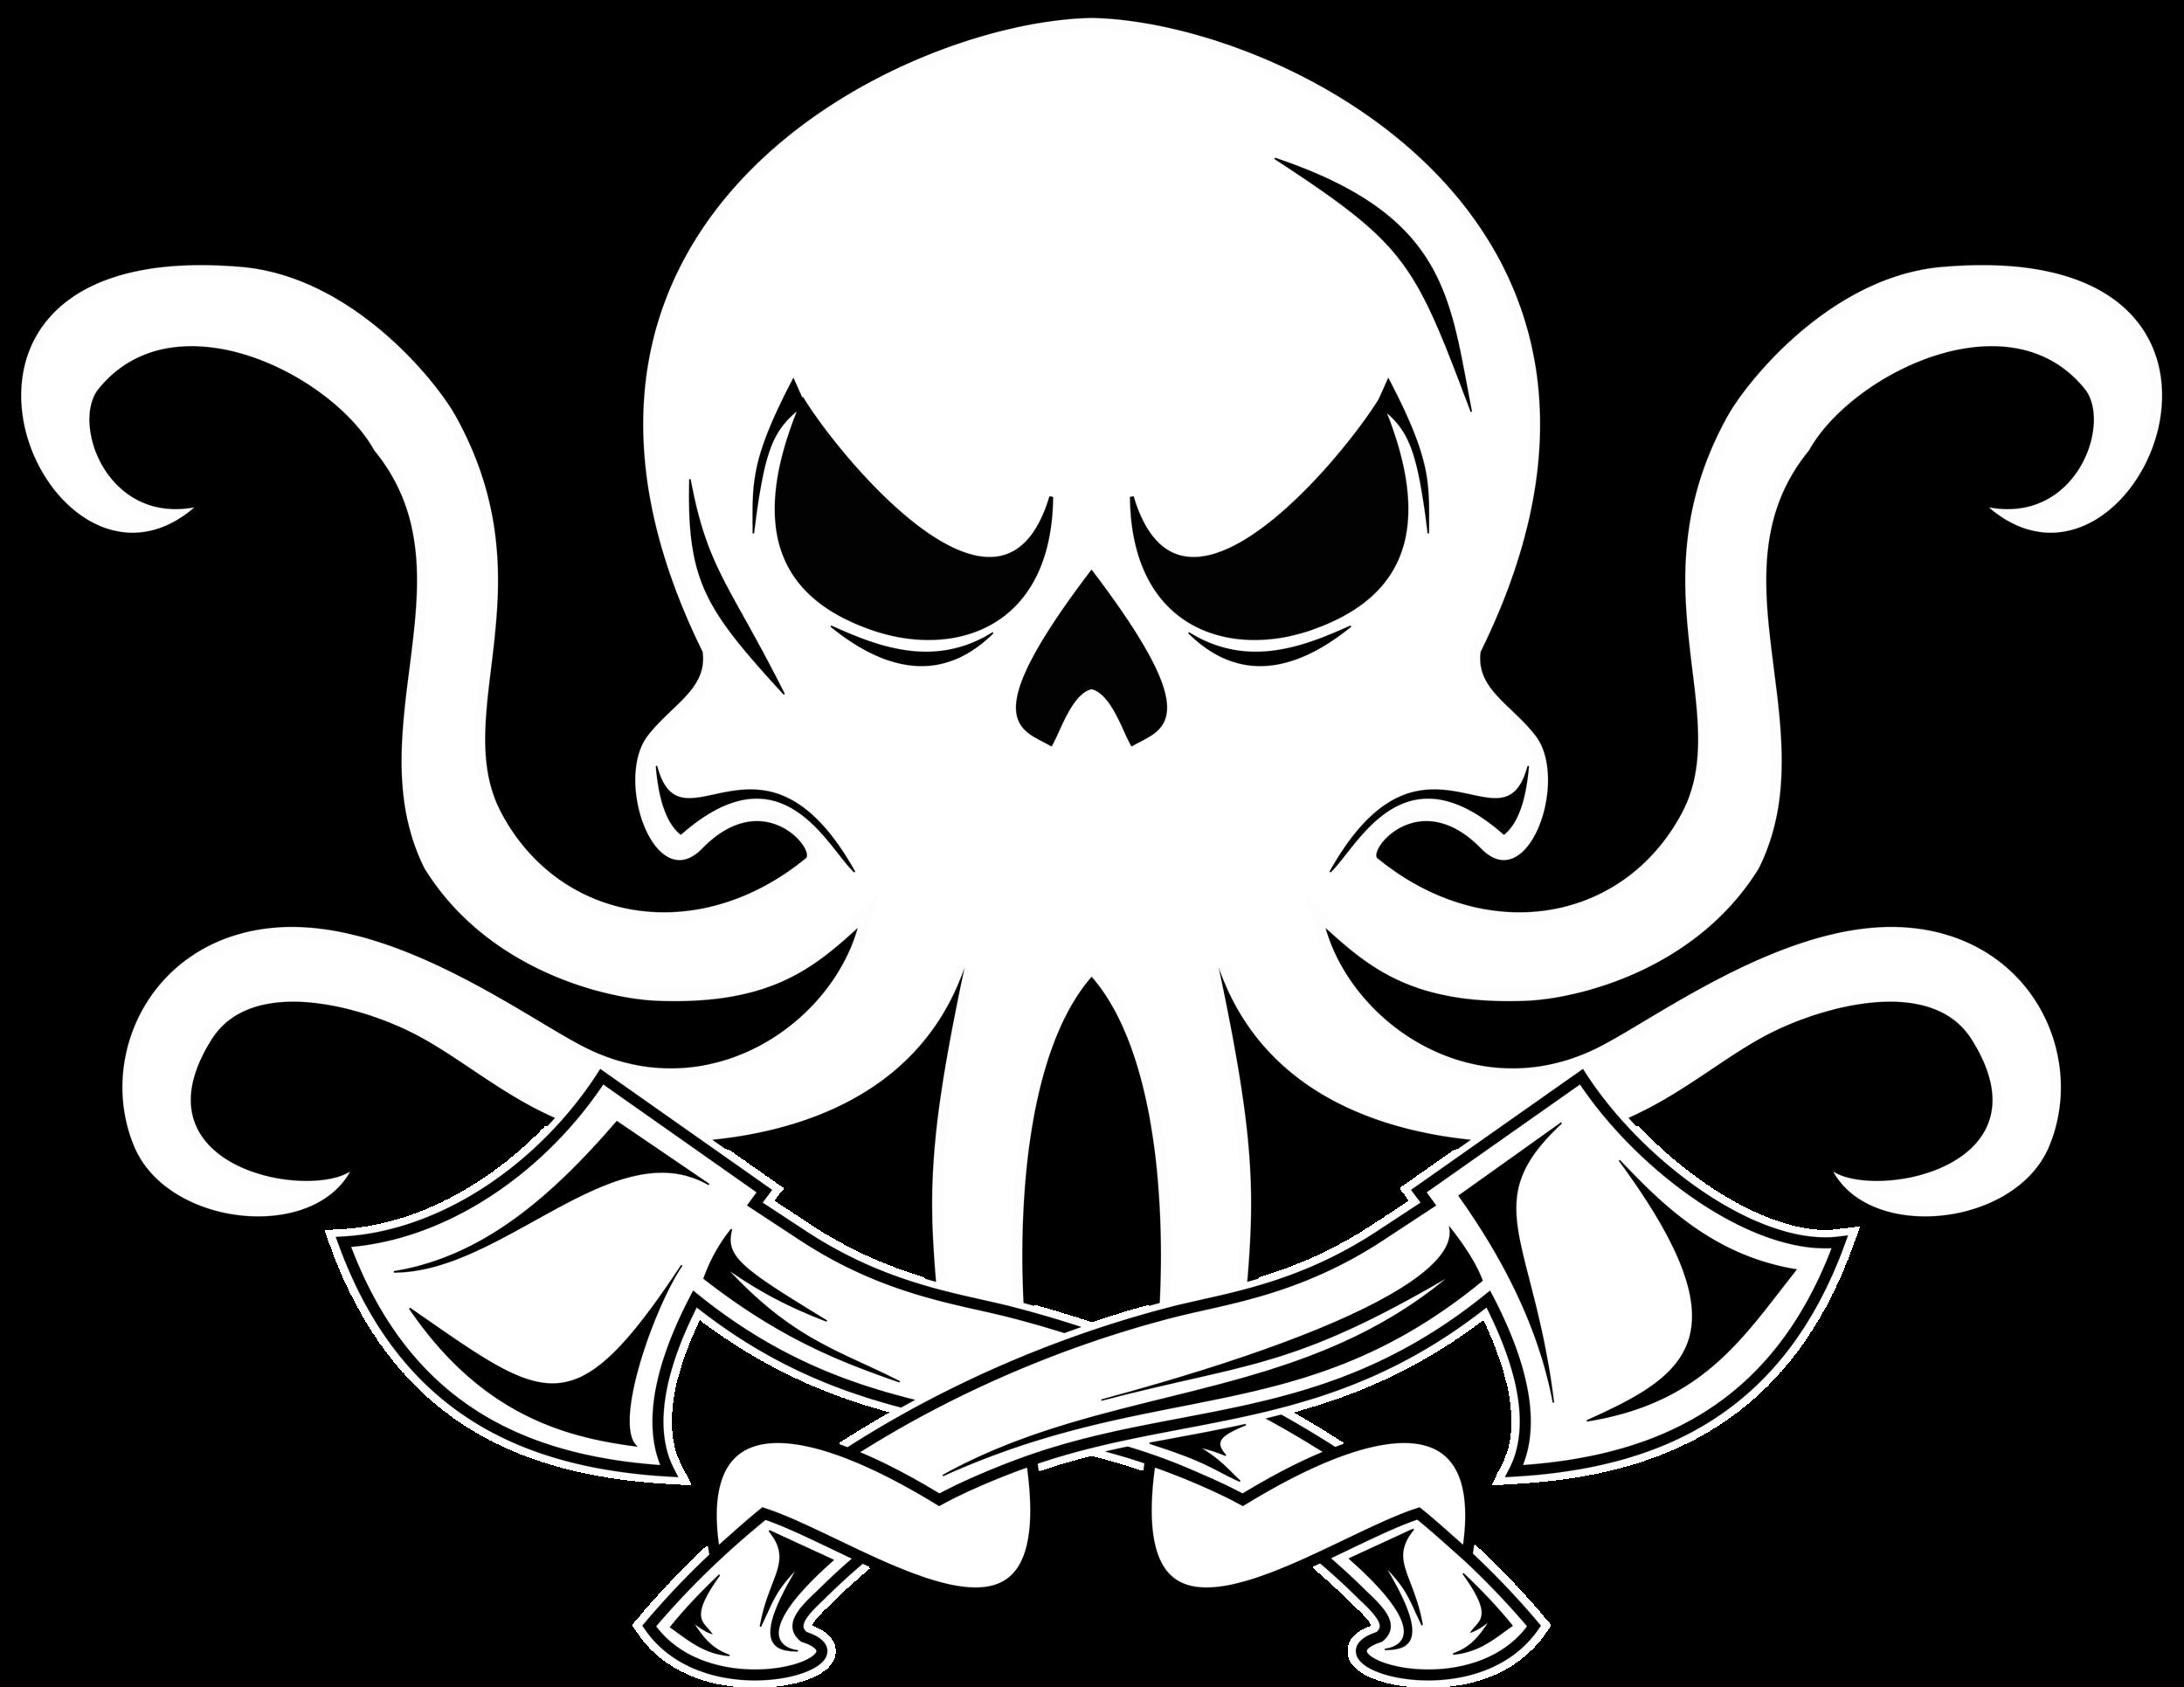 Kraken Axes-Logo-Skull Only-Lo Res-Rev0.png